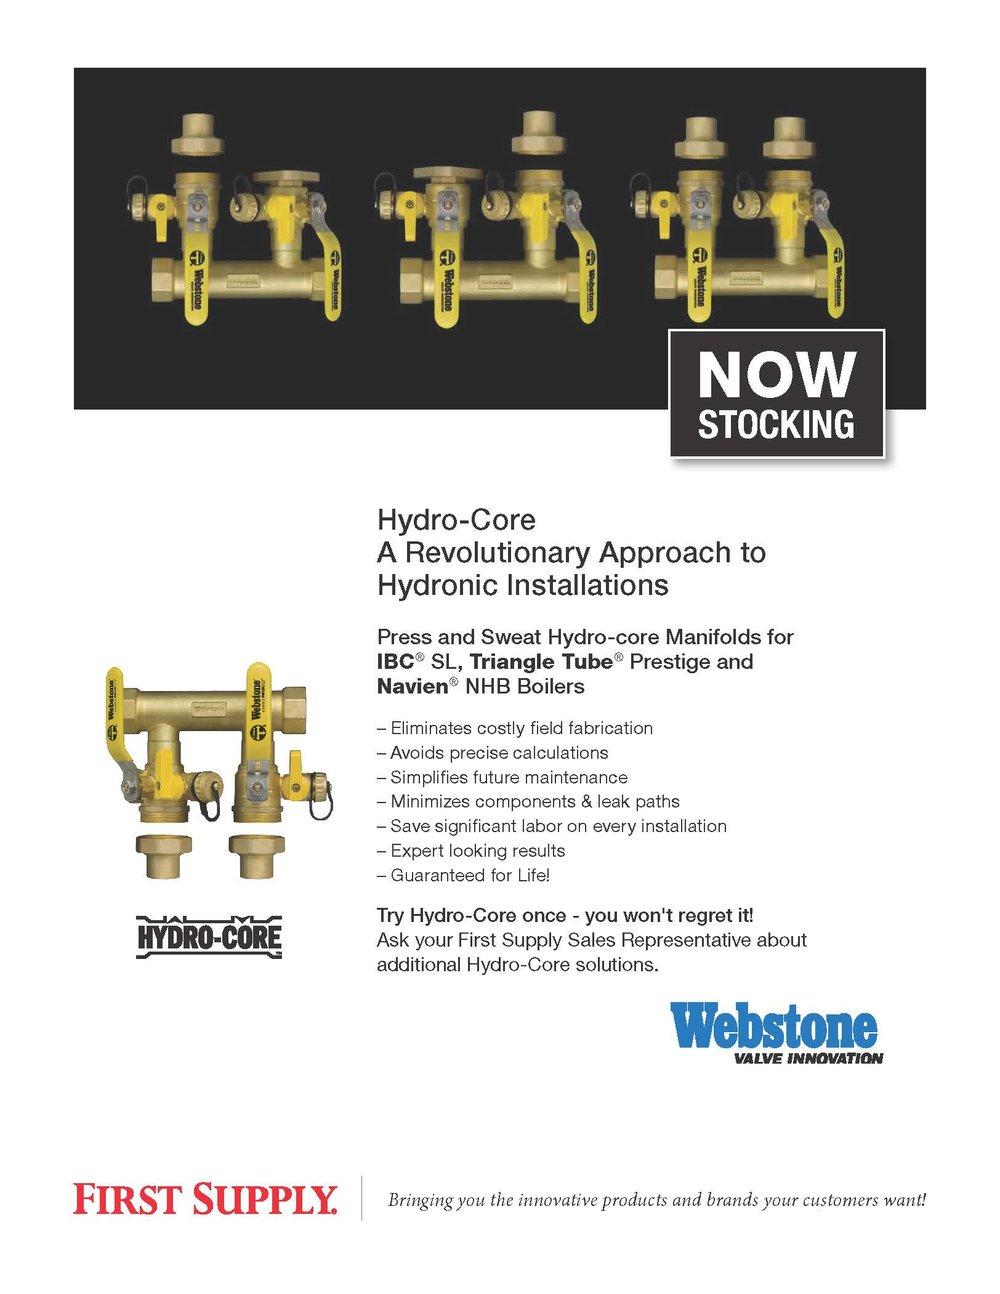 Webstone Press and Sweat Hydro-Core Boiler Manifolds